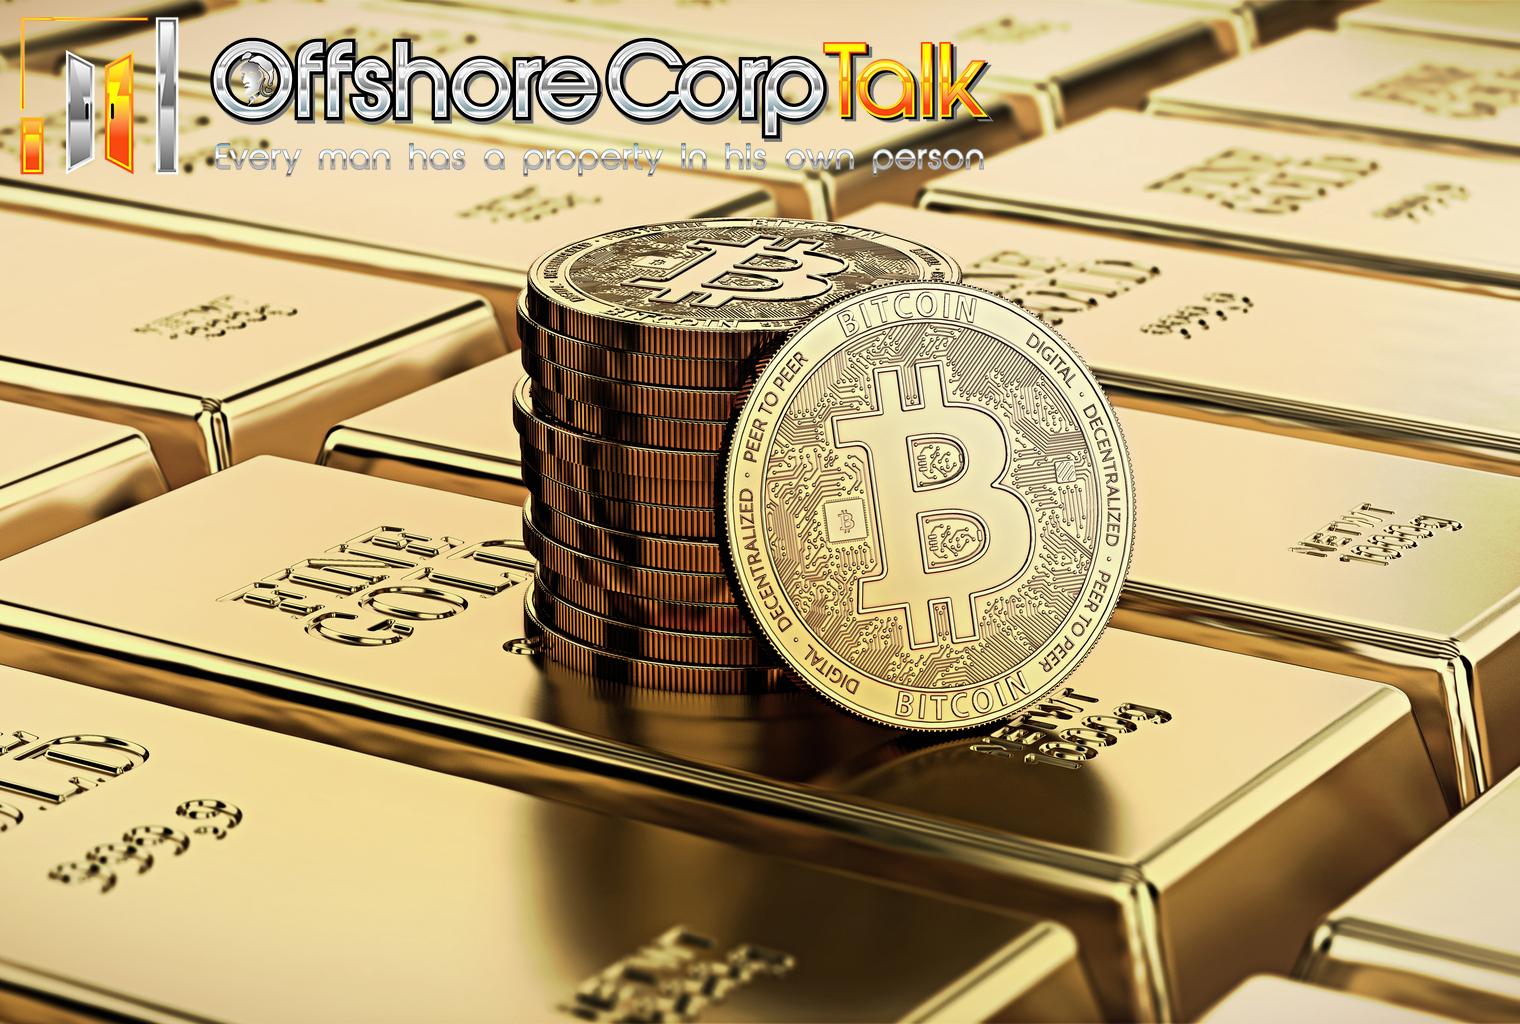 Buy Gold for Bitcoins - OffshoreCorpTalk